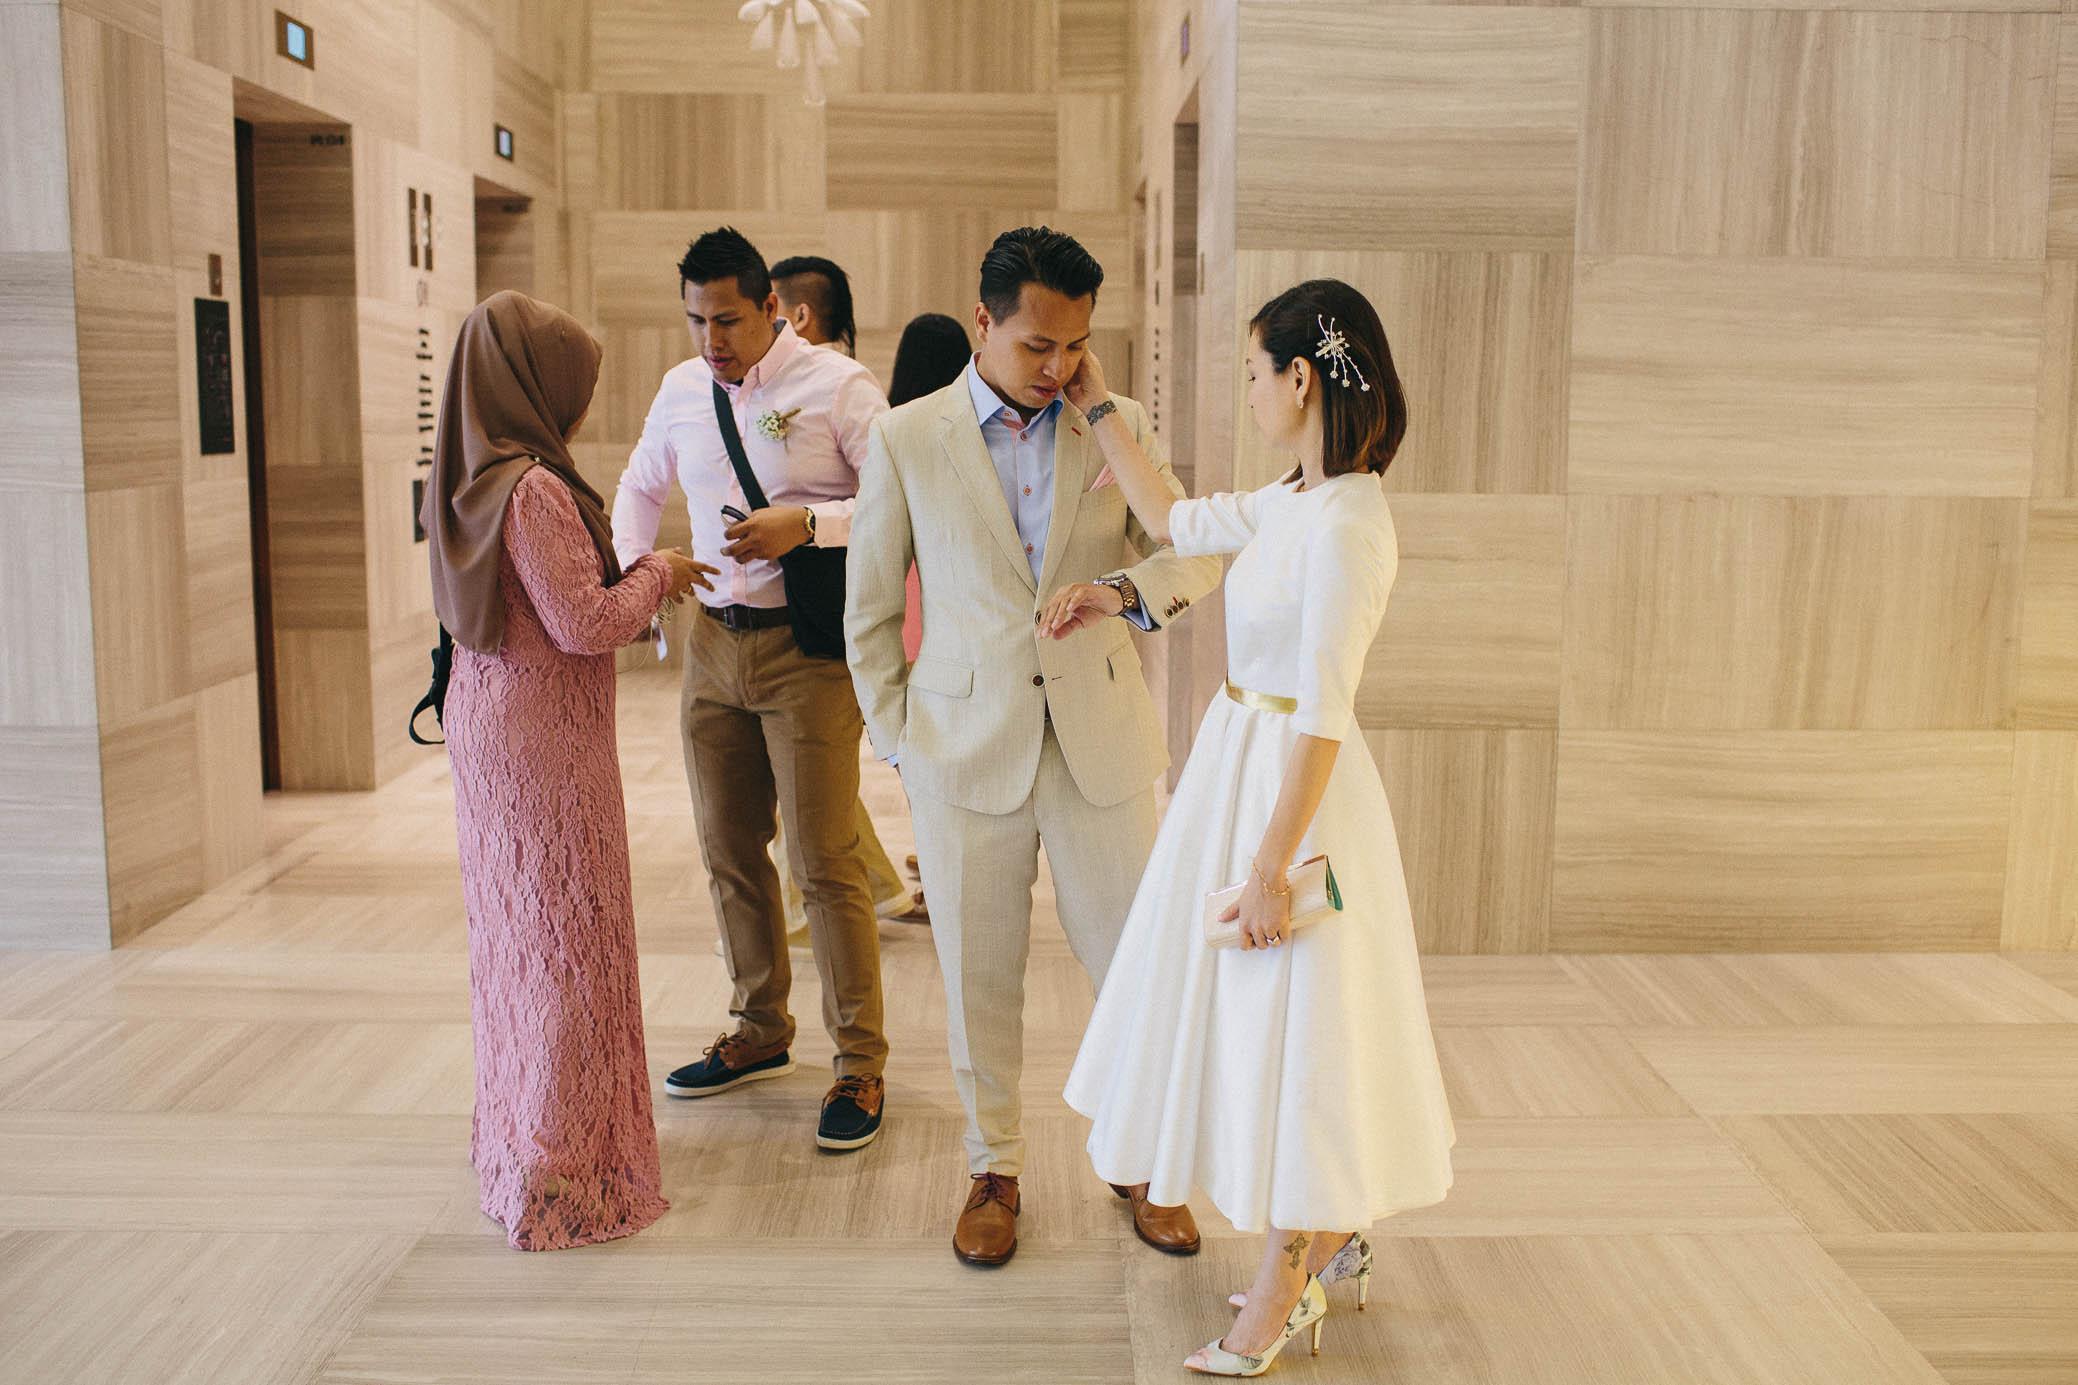 singapore-wedding-photographer-malay-indian-pre-wedding-travel-wmt-2015-alif-ethel-41.jpg